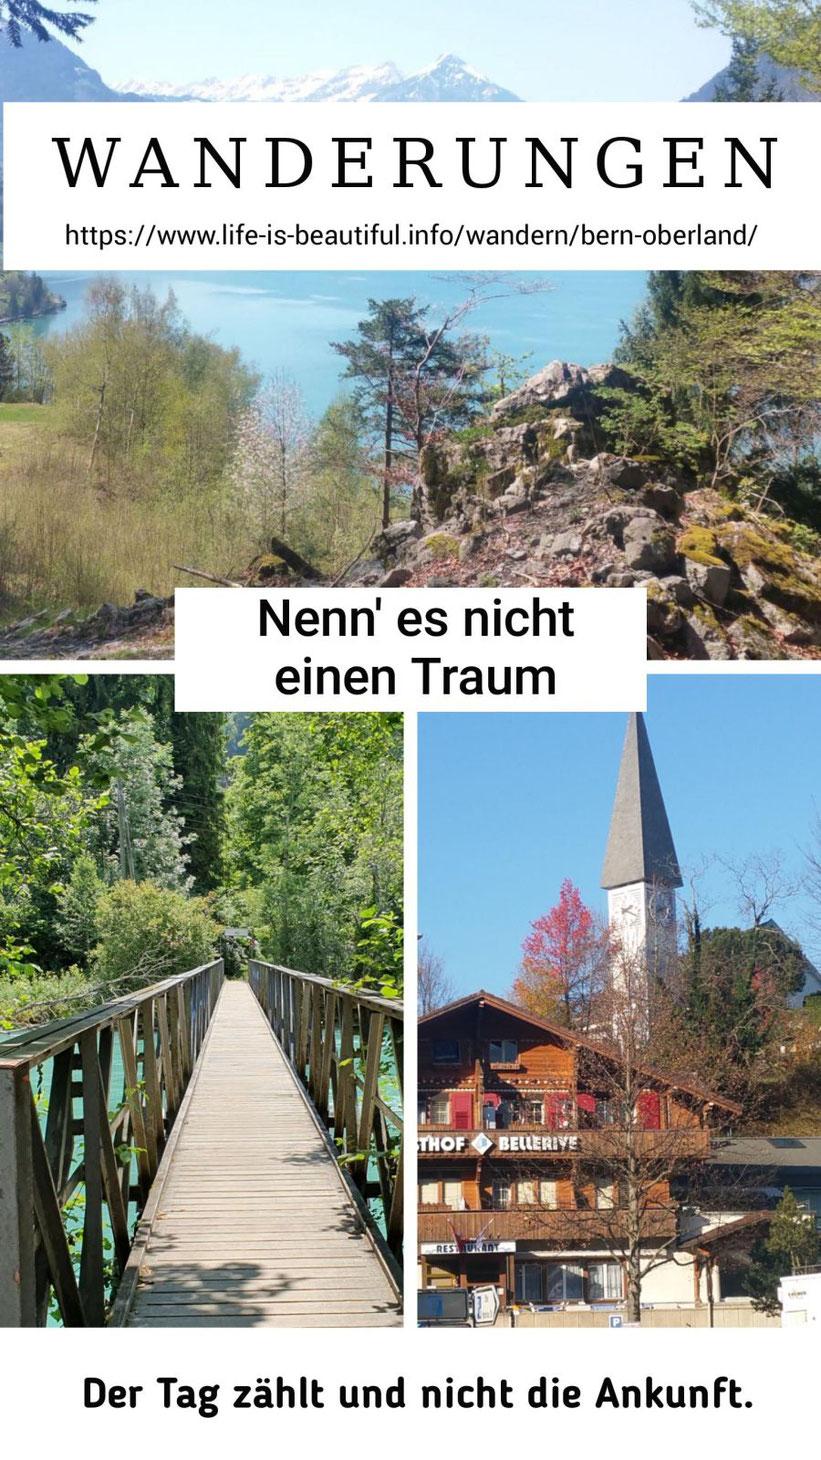 Wandern im Berner Oberland